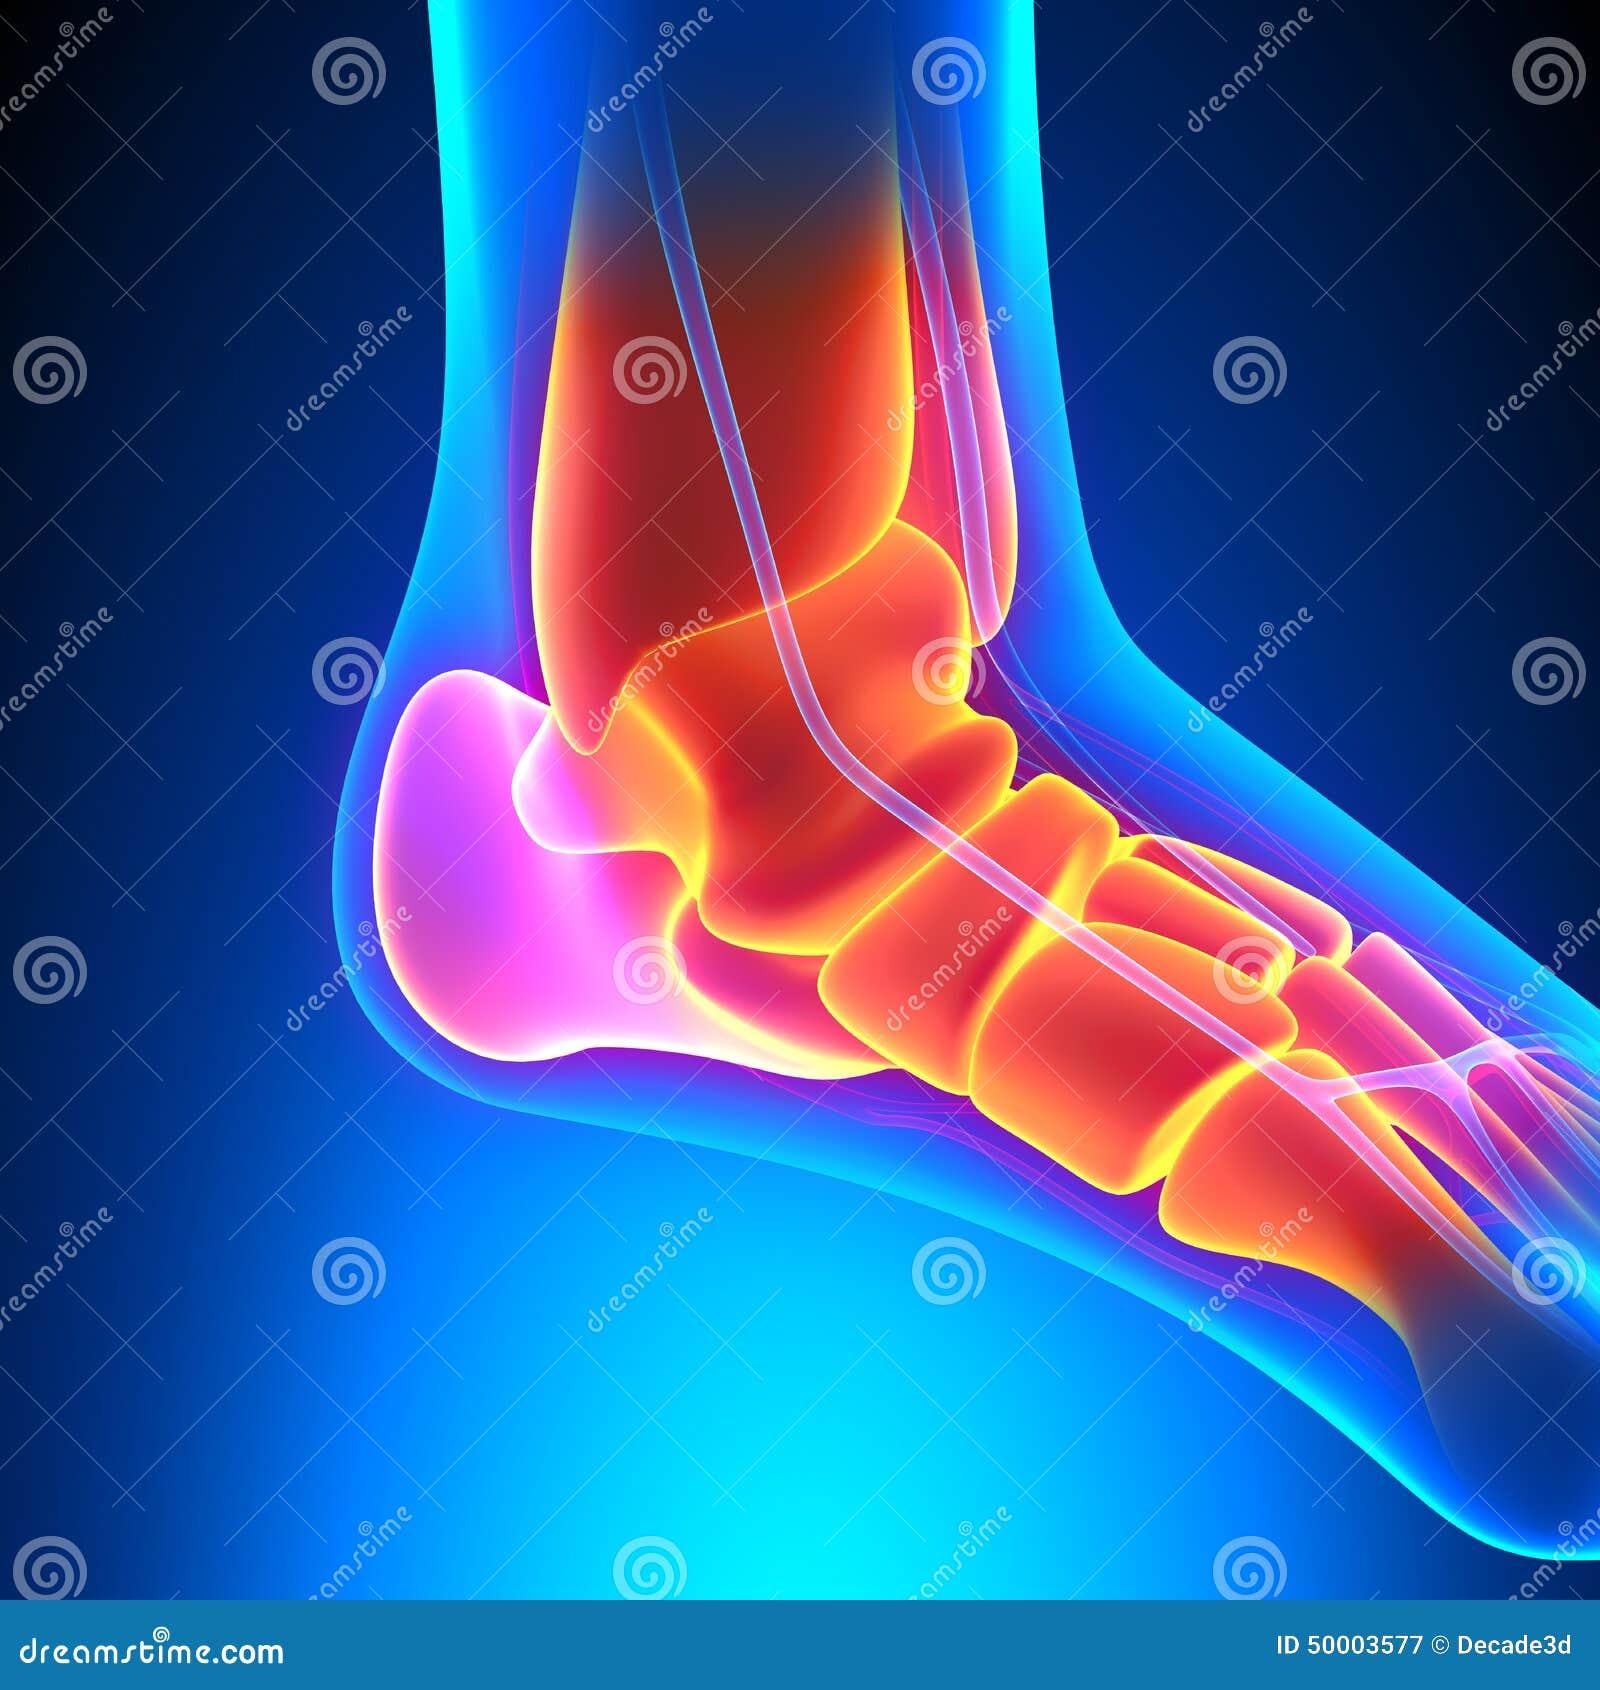 Ankle Bones Anatomy - Pain Concept Stock Illustration - Illustration ...